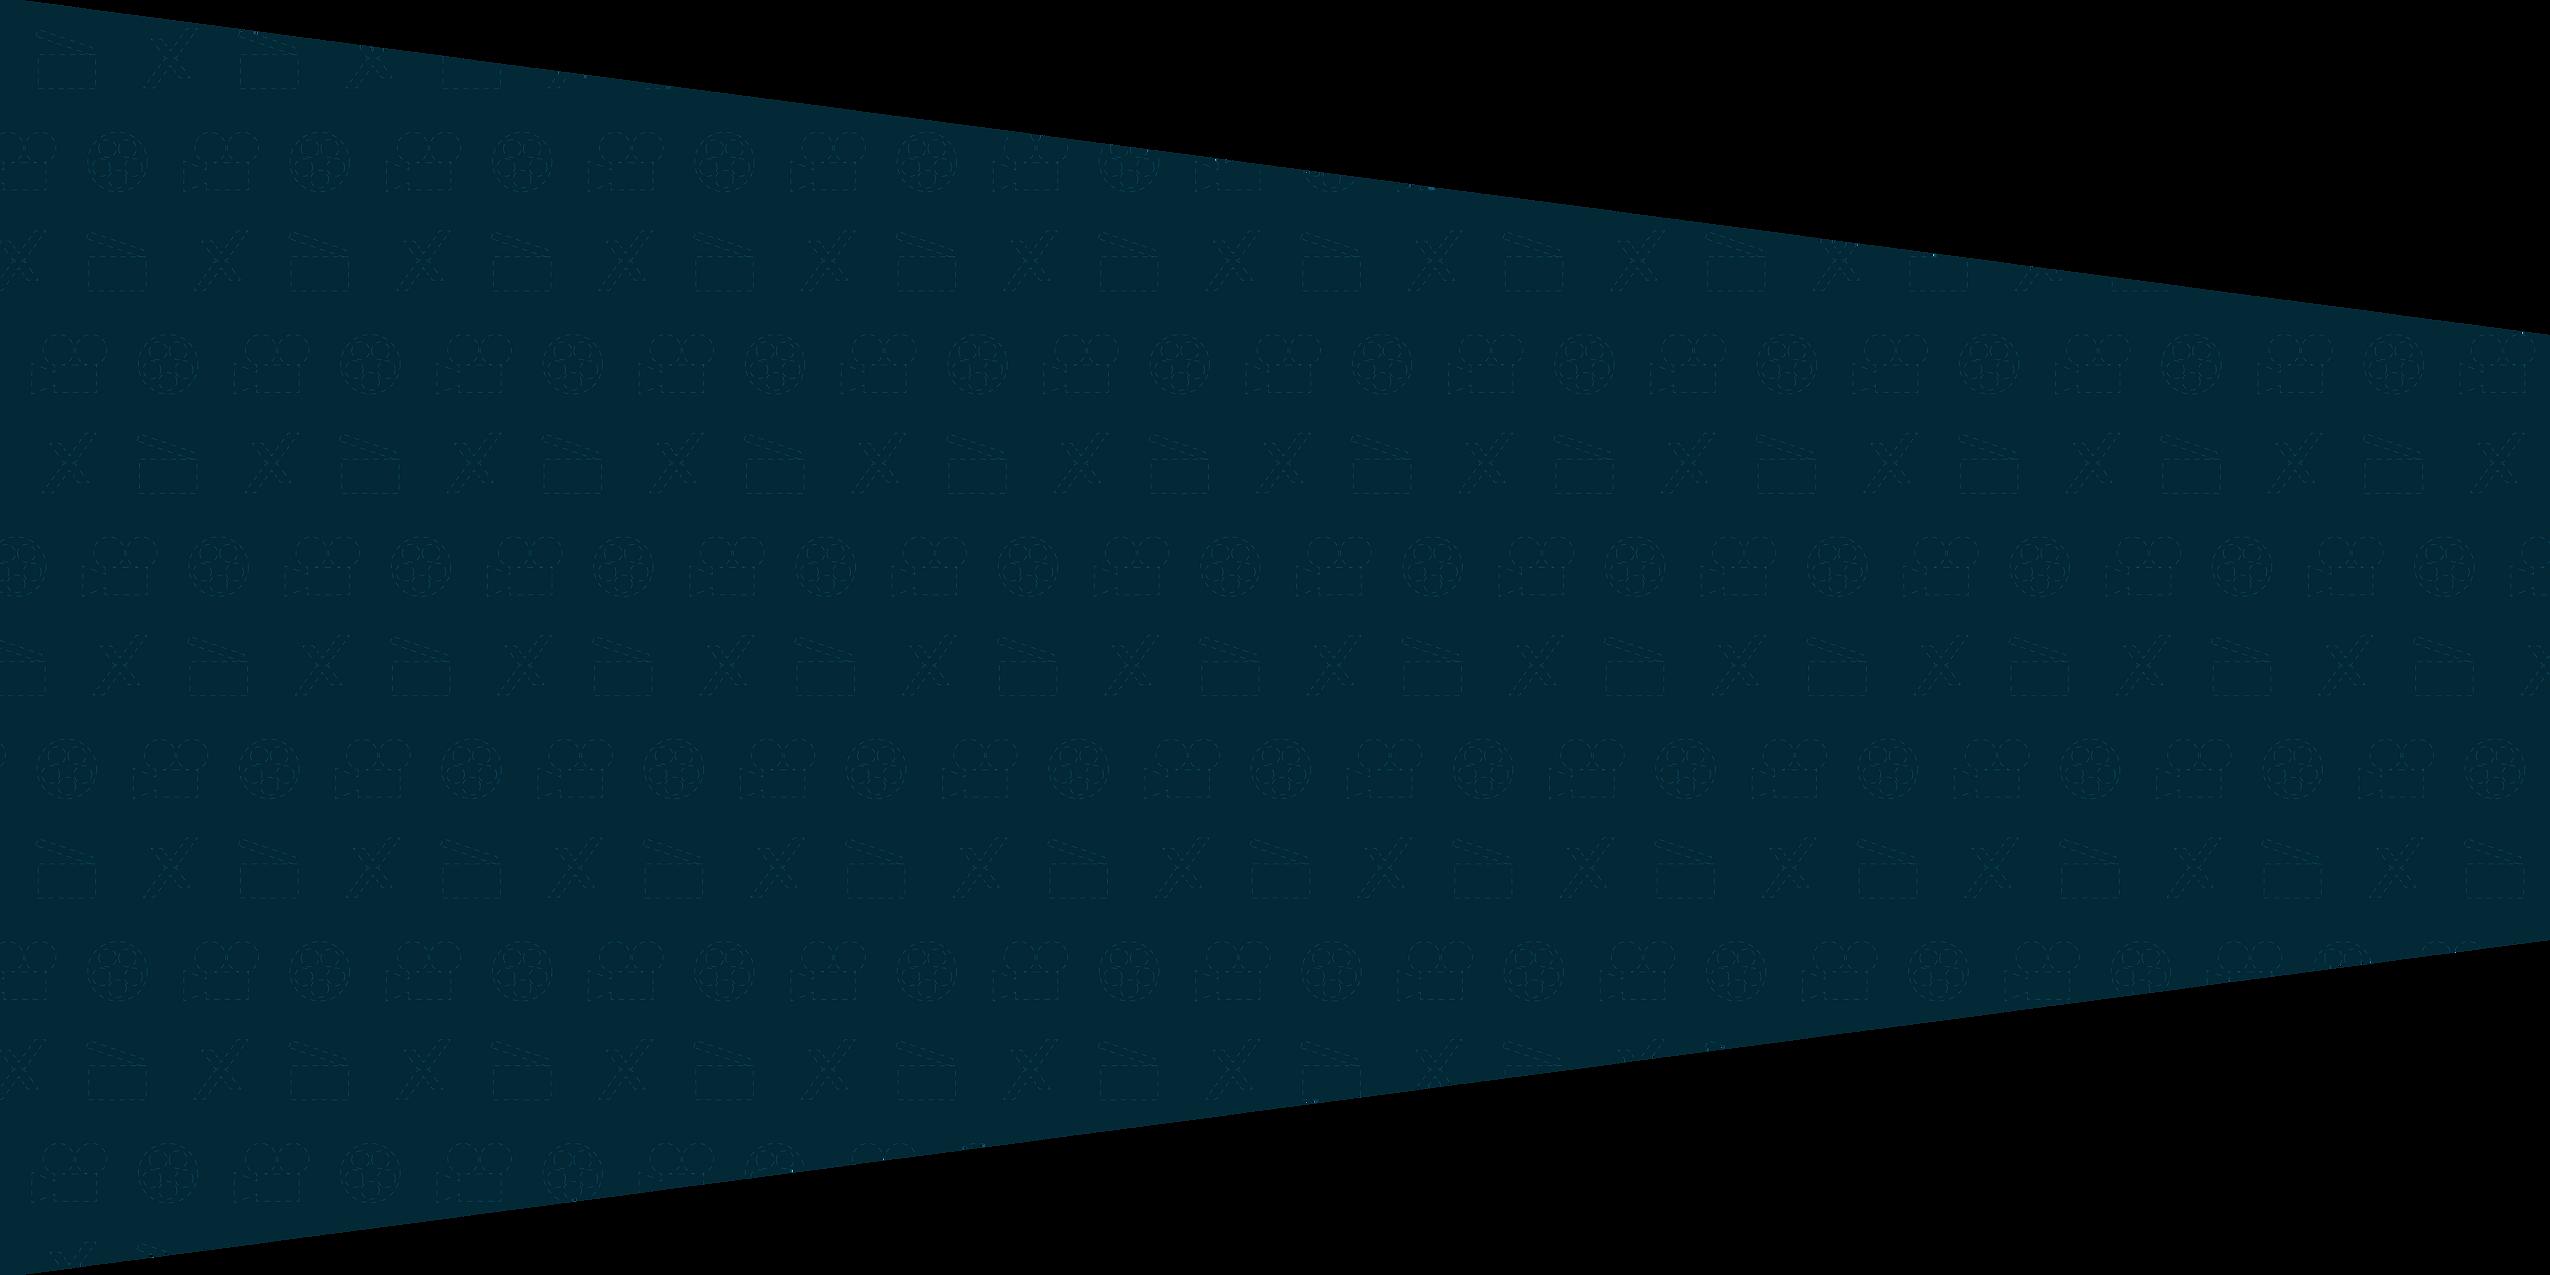 Schrägen_2x1_200613_2.png